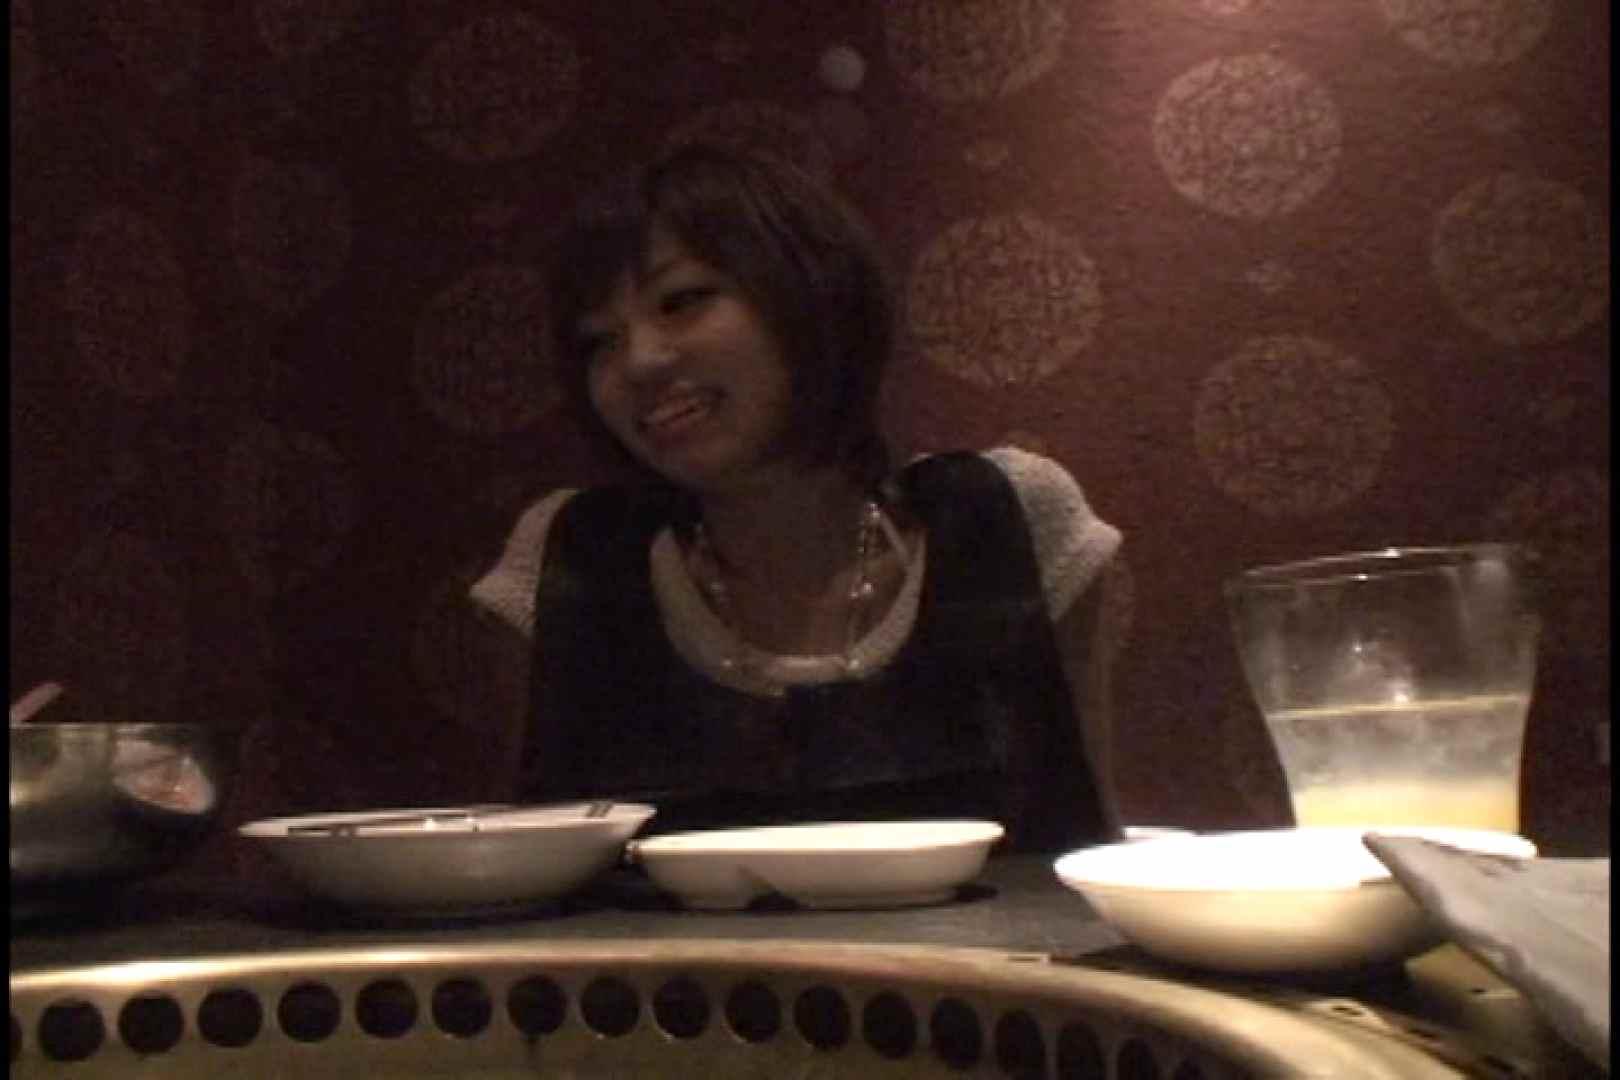 JDハンター全国ツアー vol.026 前編 萌え女子大生   OL女体  74連発 41